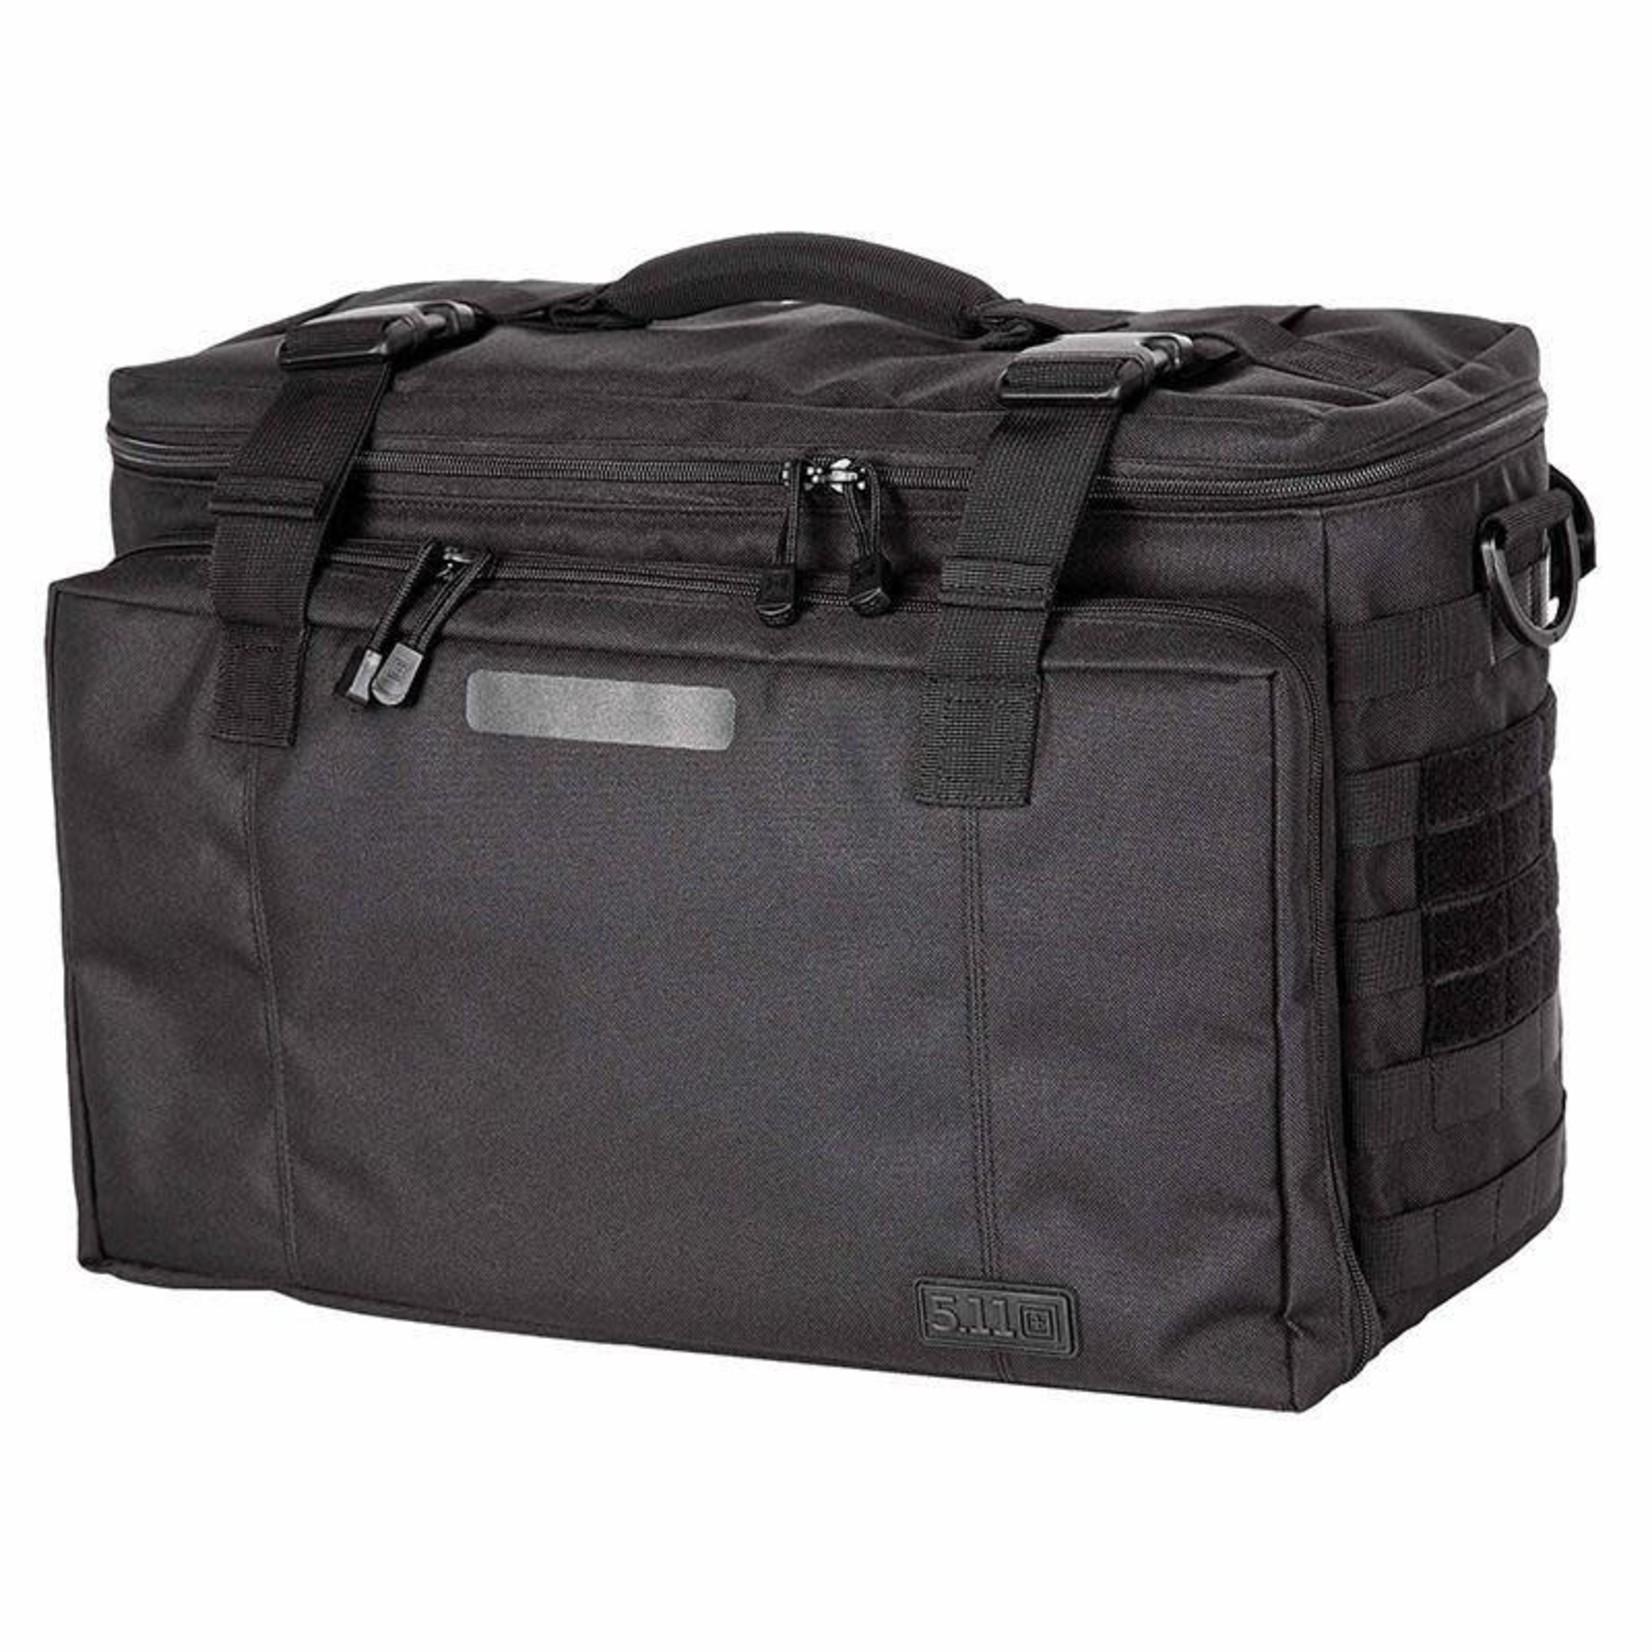 5.11 Tactical 5.11 Wingman Patrol Bag